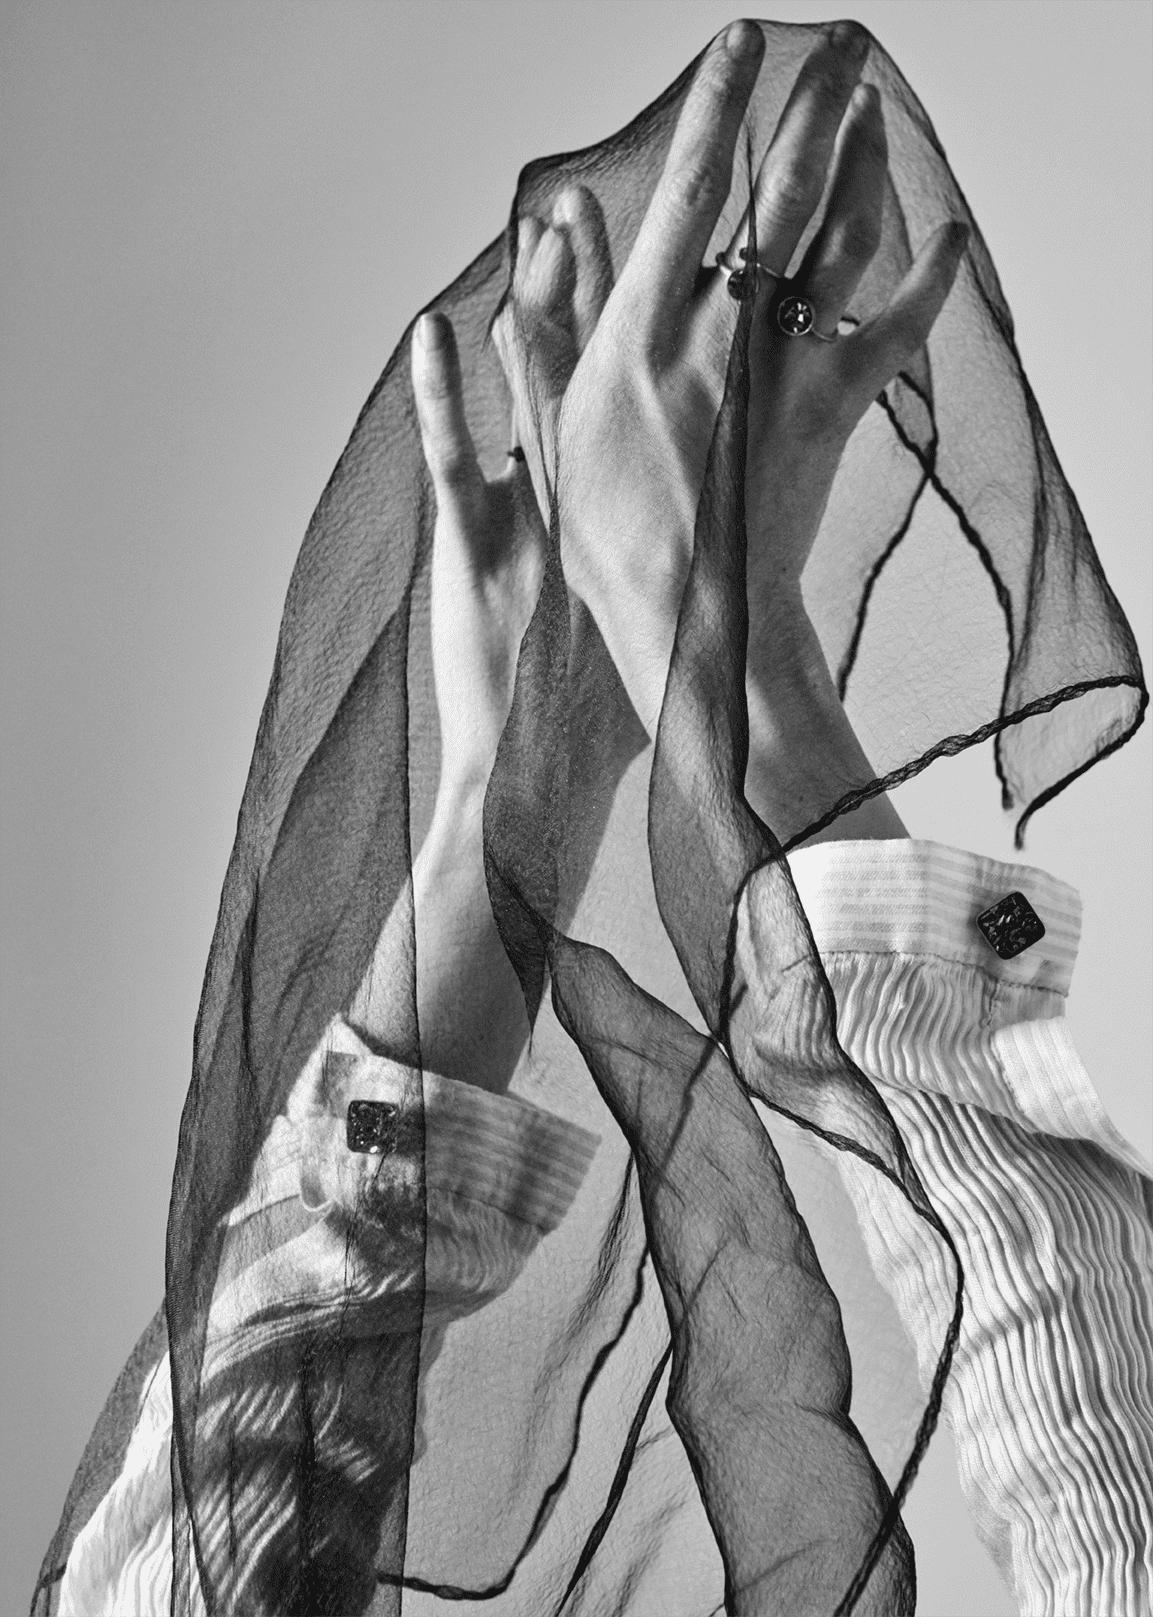 © Baumgarten Di Marco